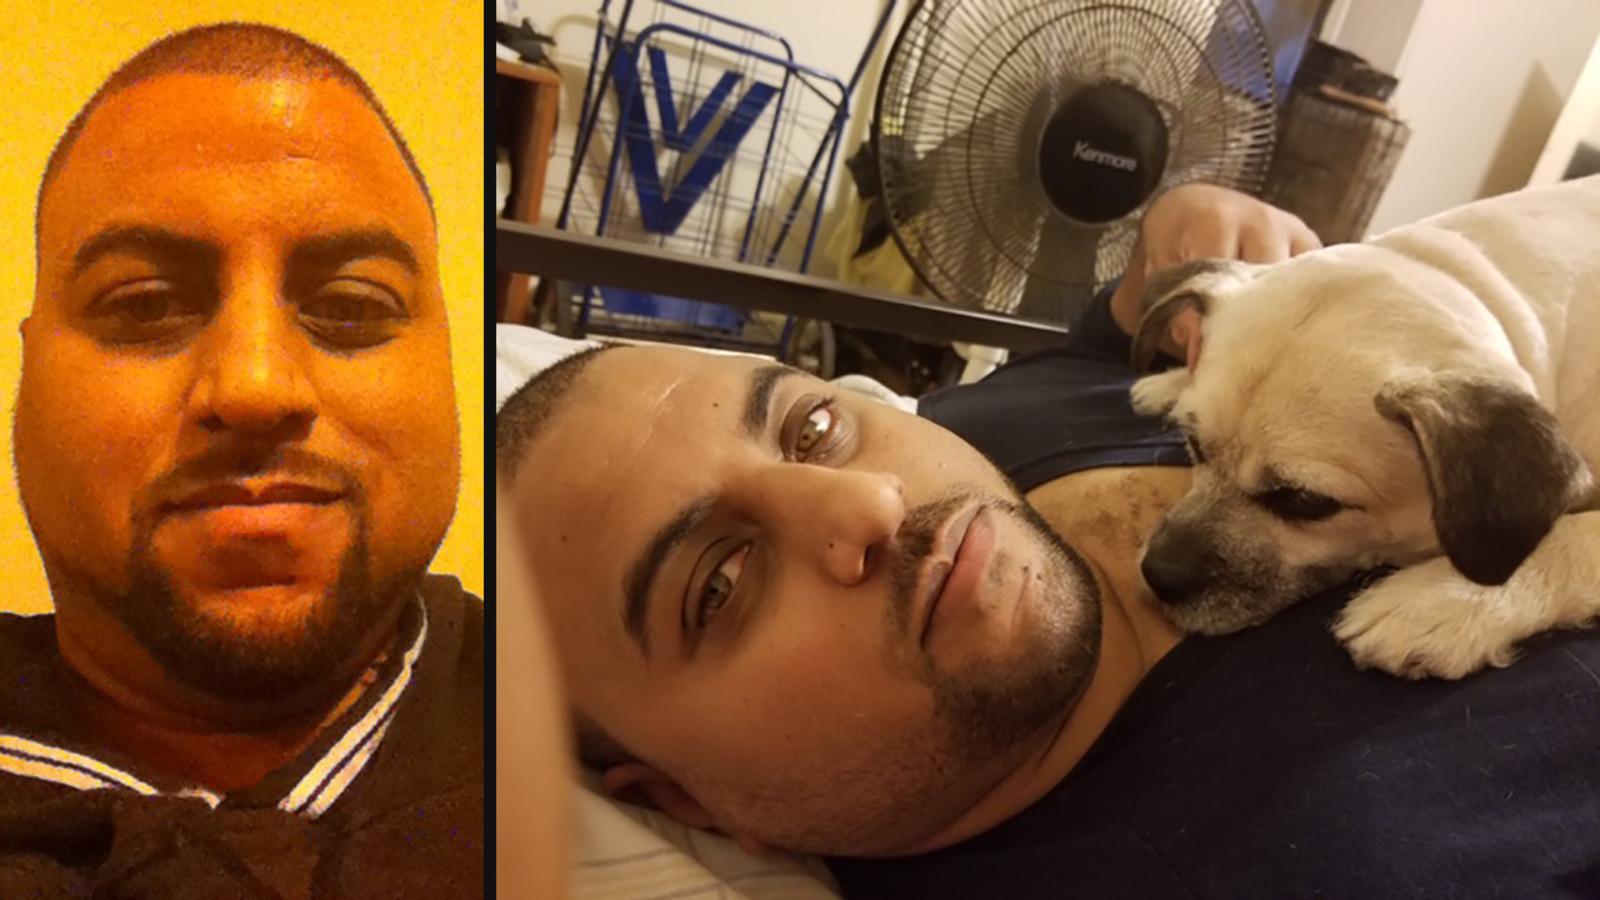 Man walking dog fatally shot by stray bullet in Manhattan